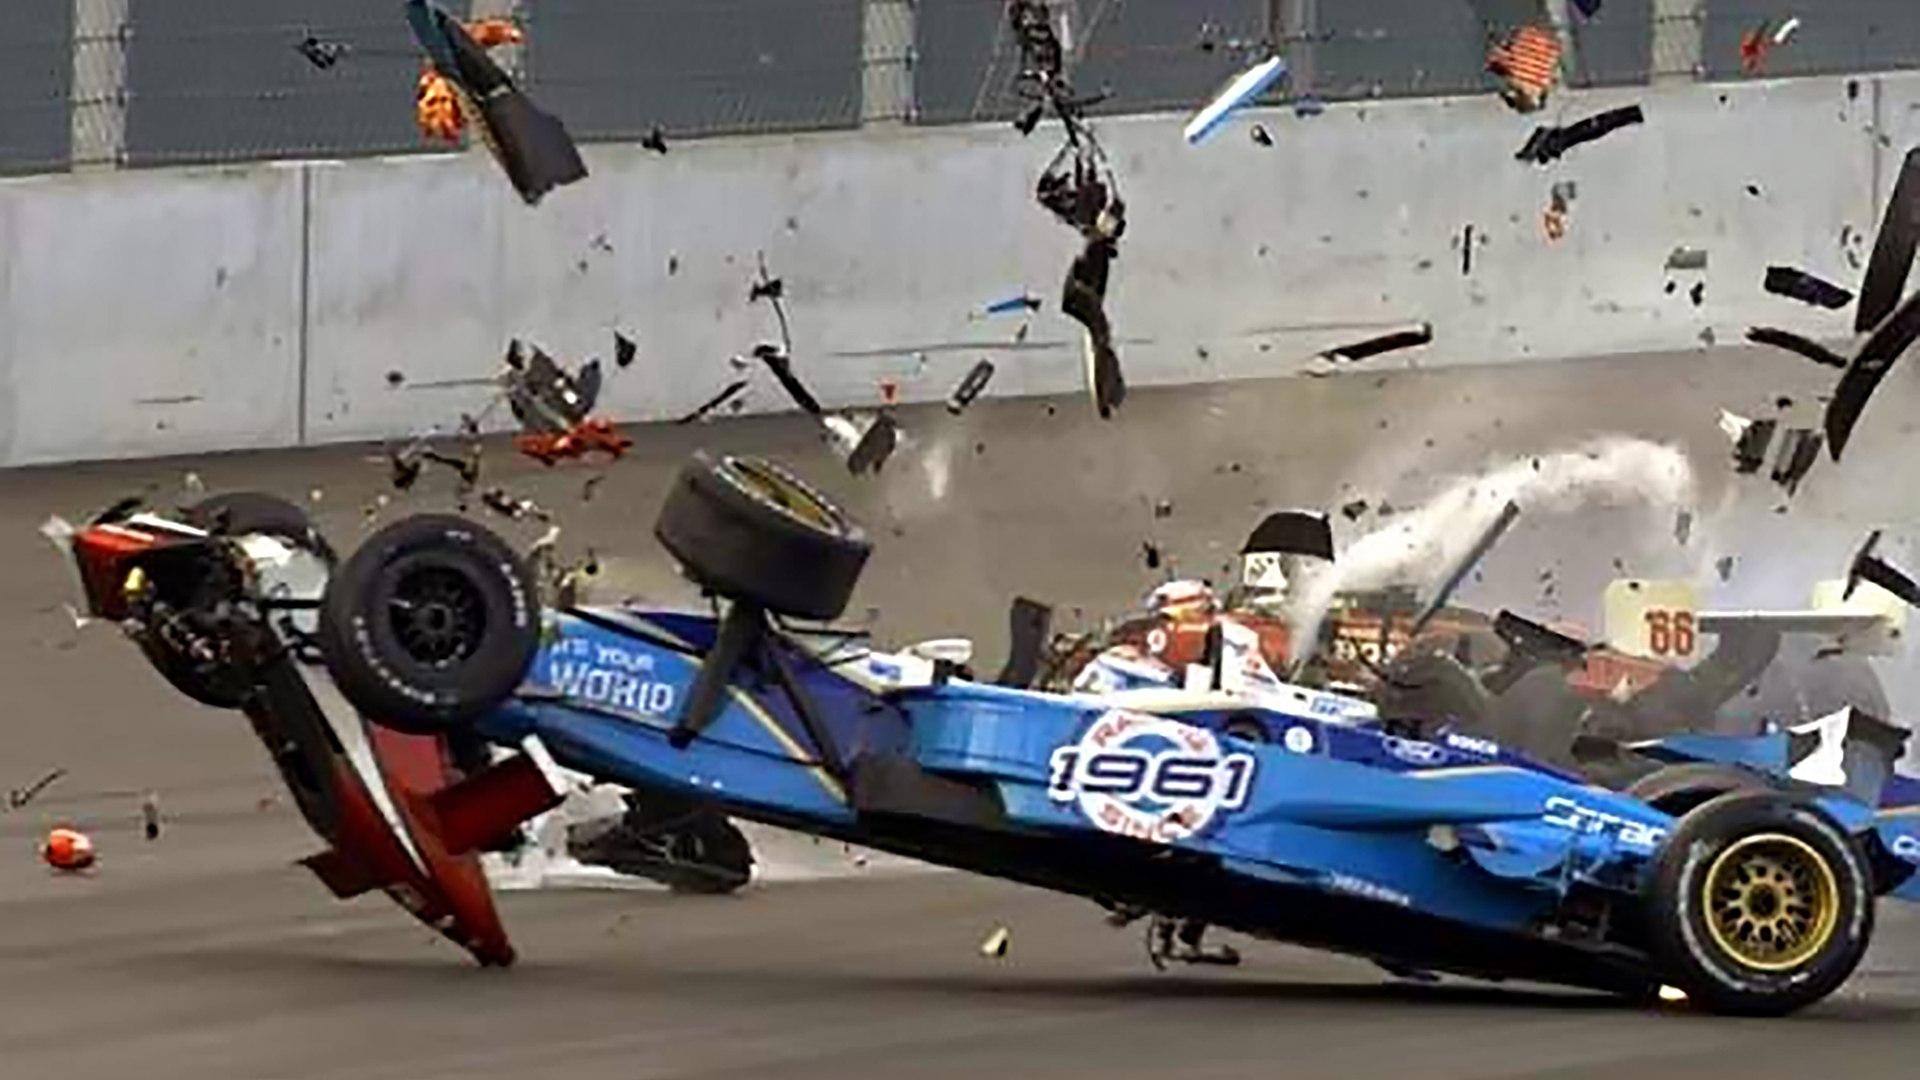 Alex Zanardi nearly fatal crash at EuroSpeedway - All Angles + ...